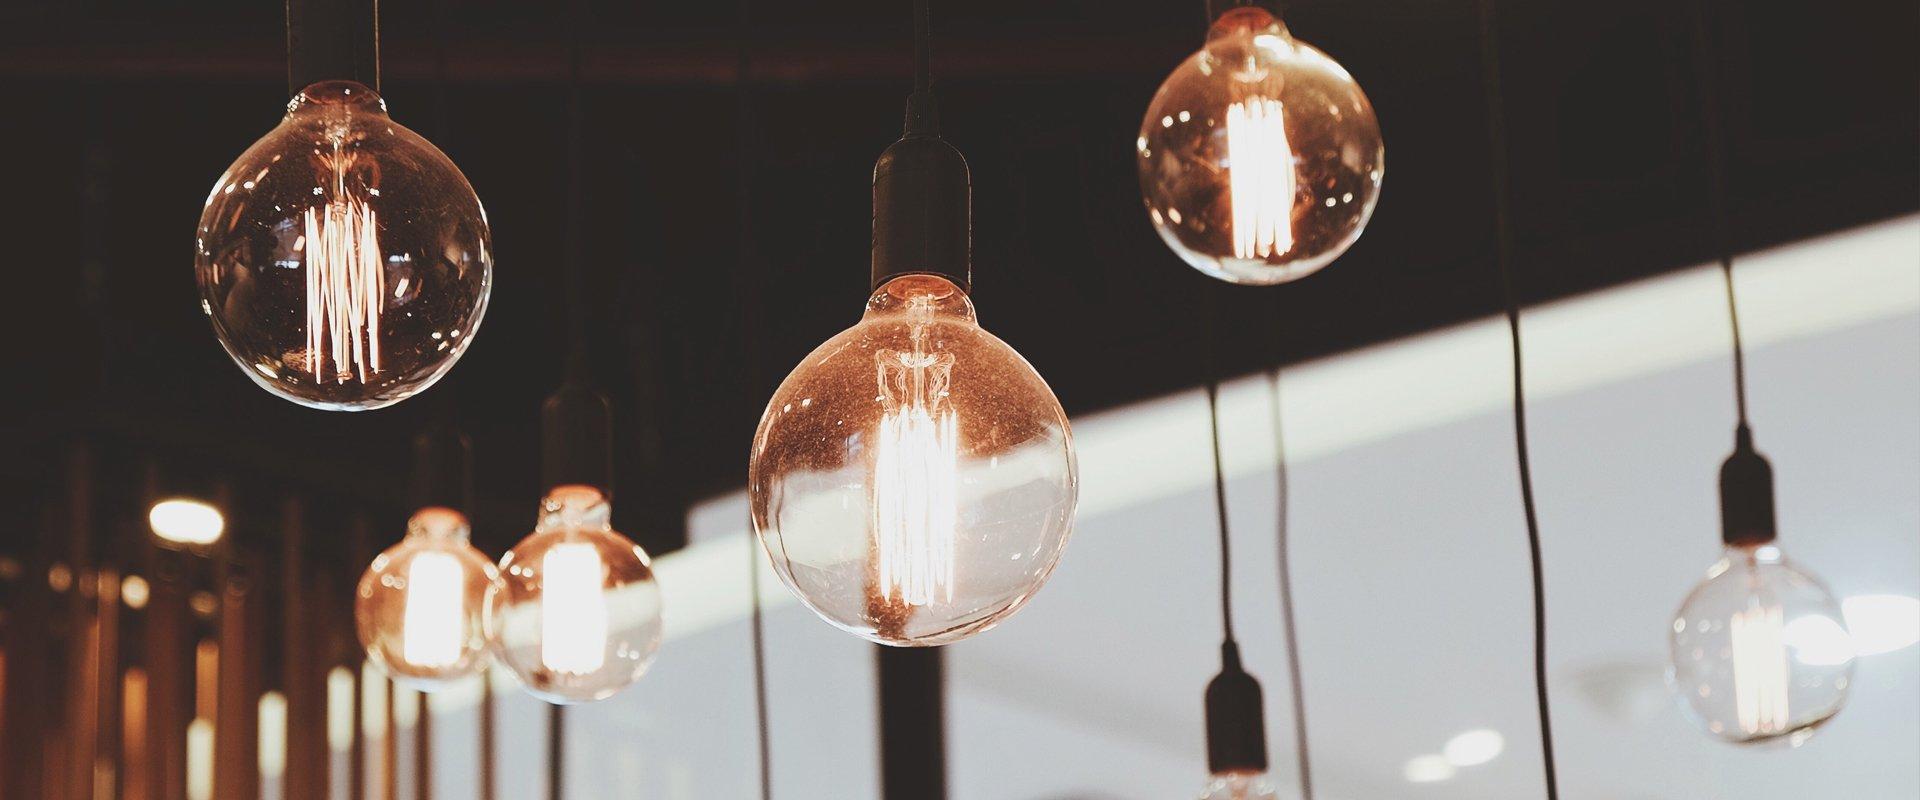 electrical light